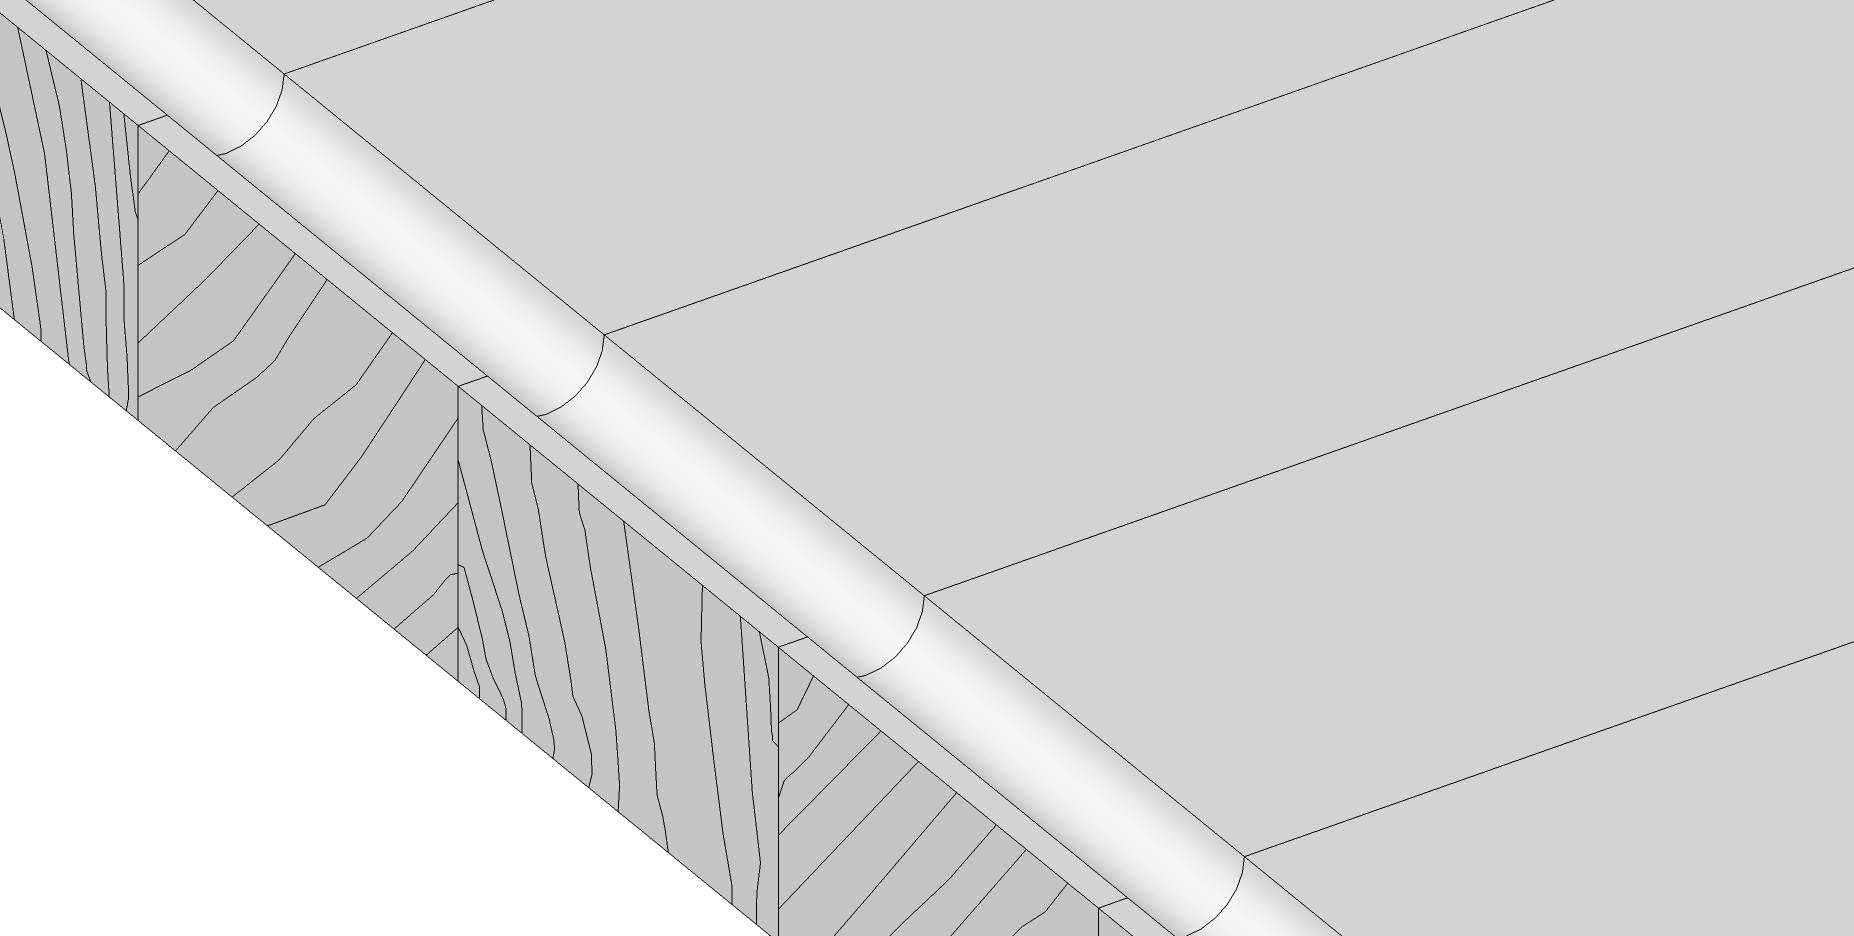 Holzschneidebrett premium Brettevolution 3cm saftrille zu nah am rand